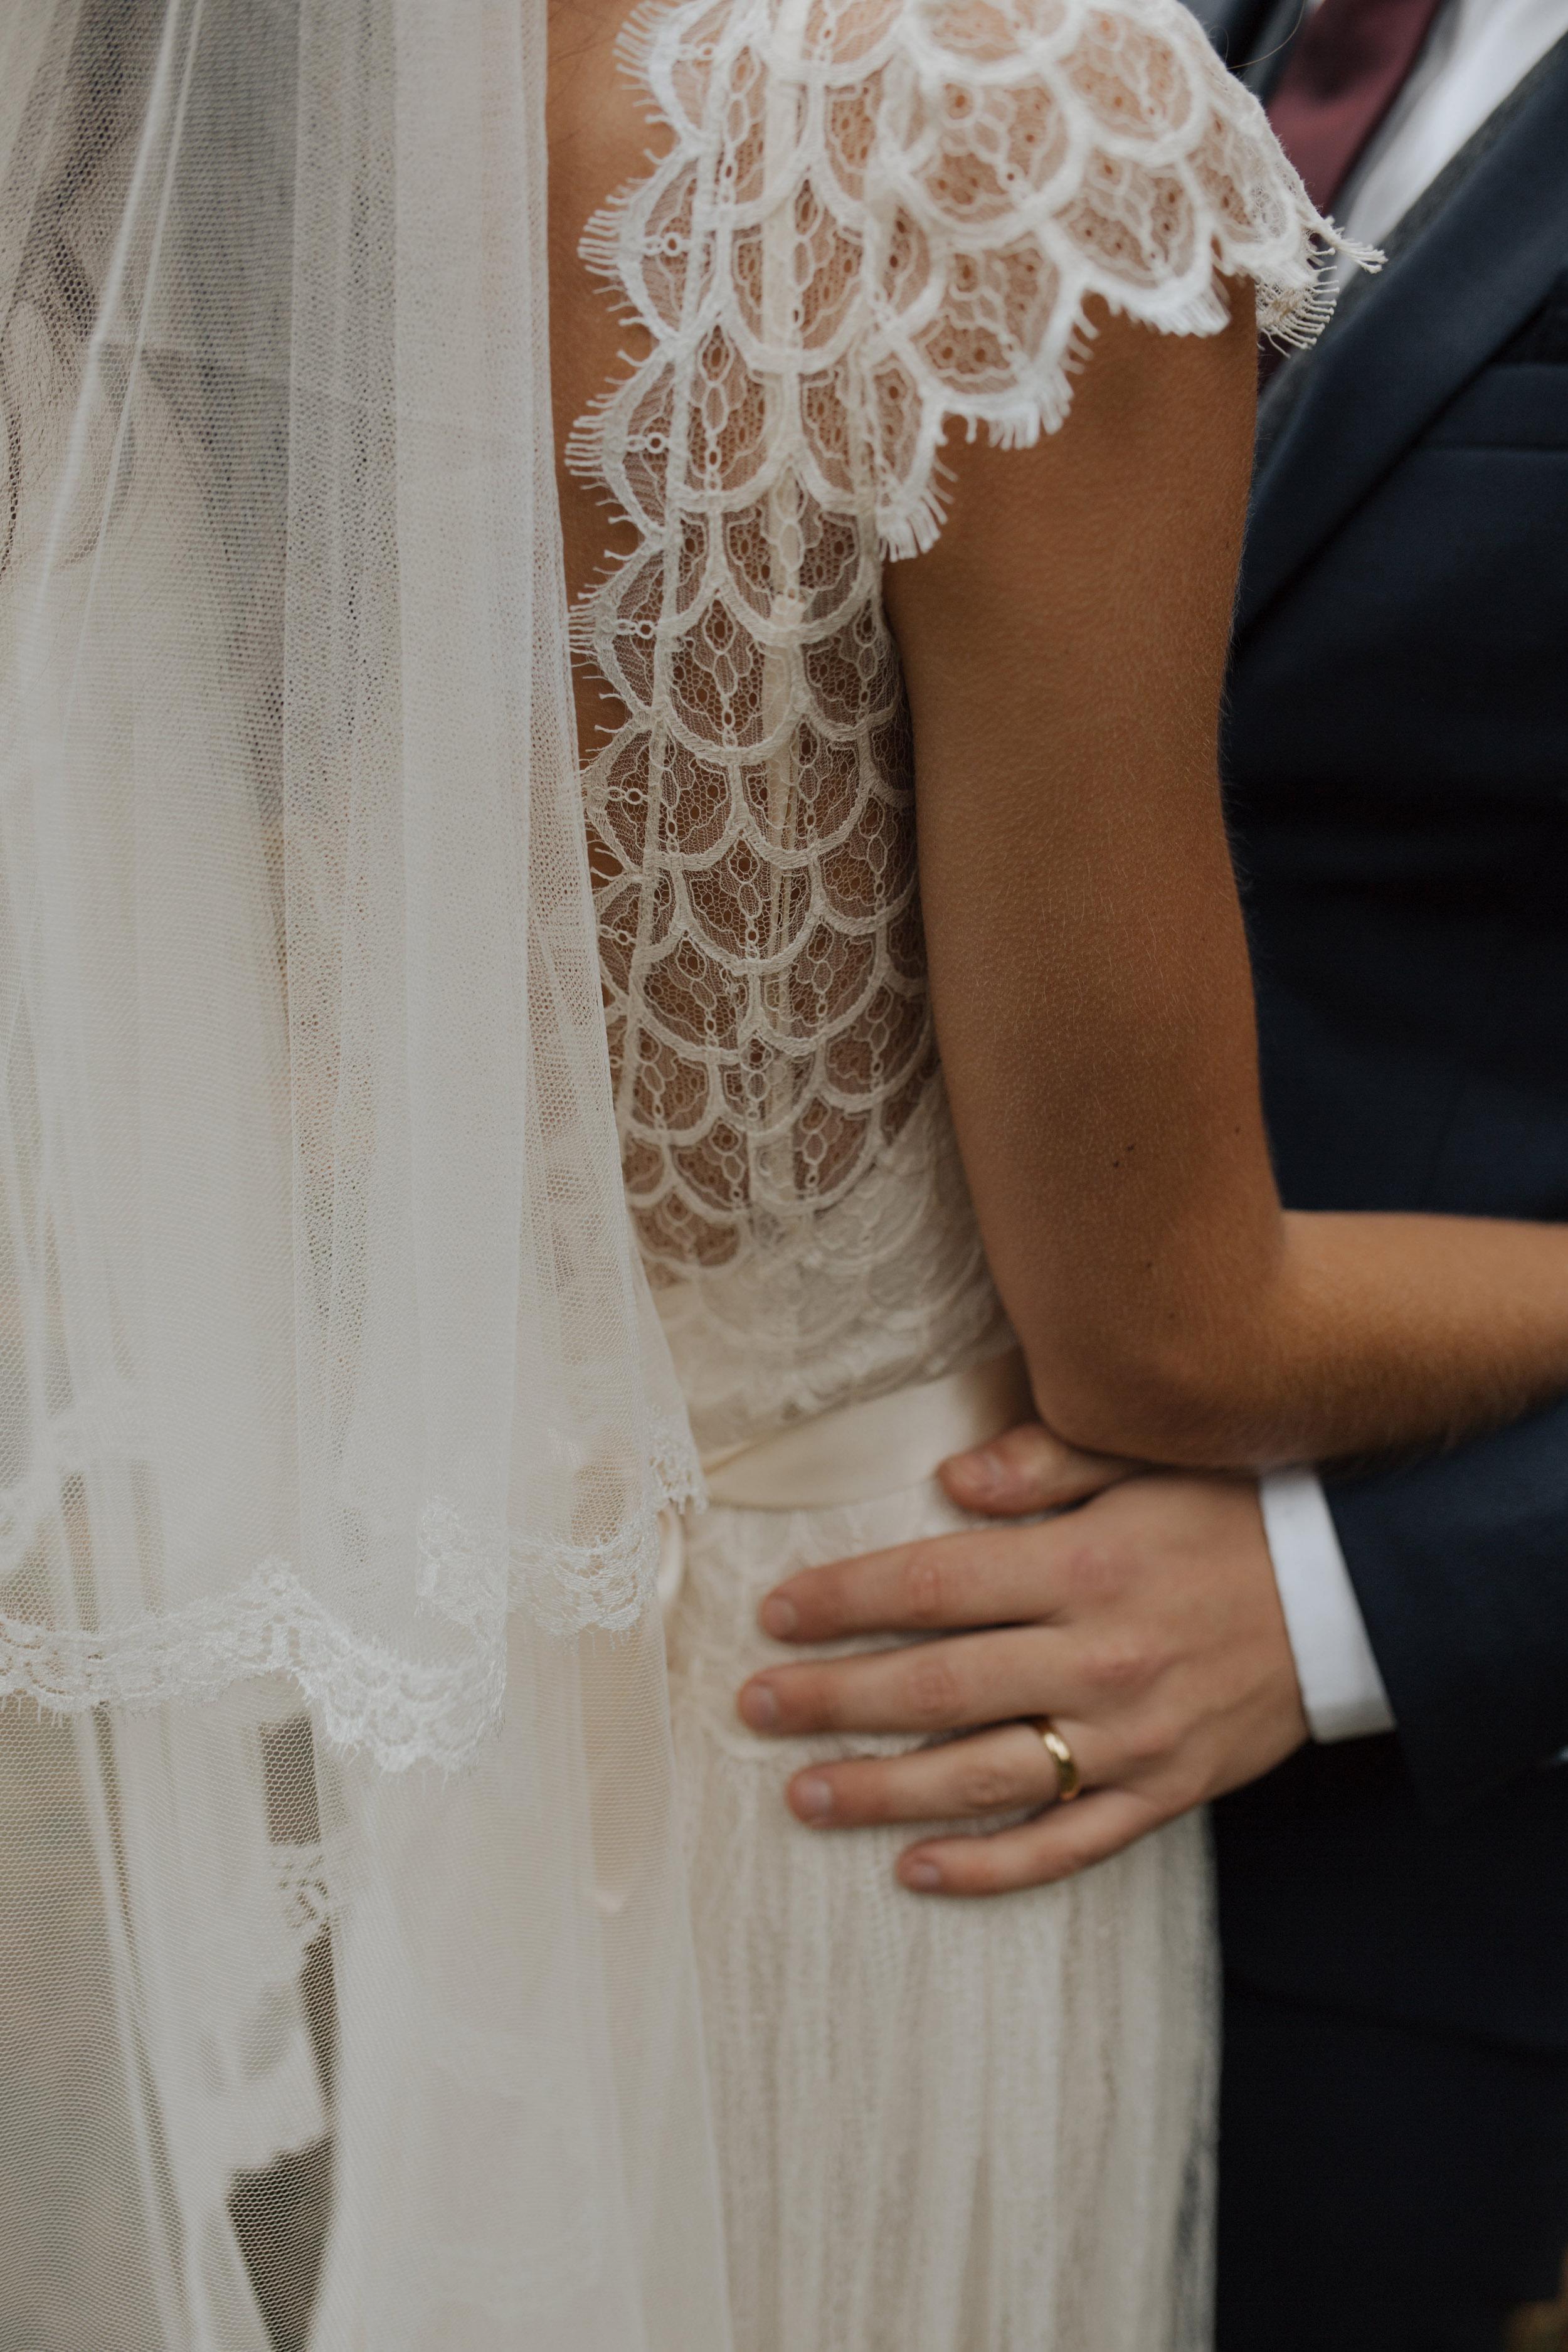 Joasia-Kate-Beaumont-Bohemian-Lace-Wedding-Dress-Peak-District-Sheffield-Wedding-34.jpg